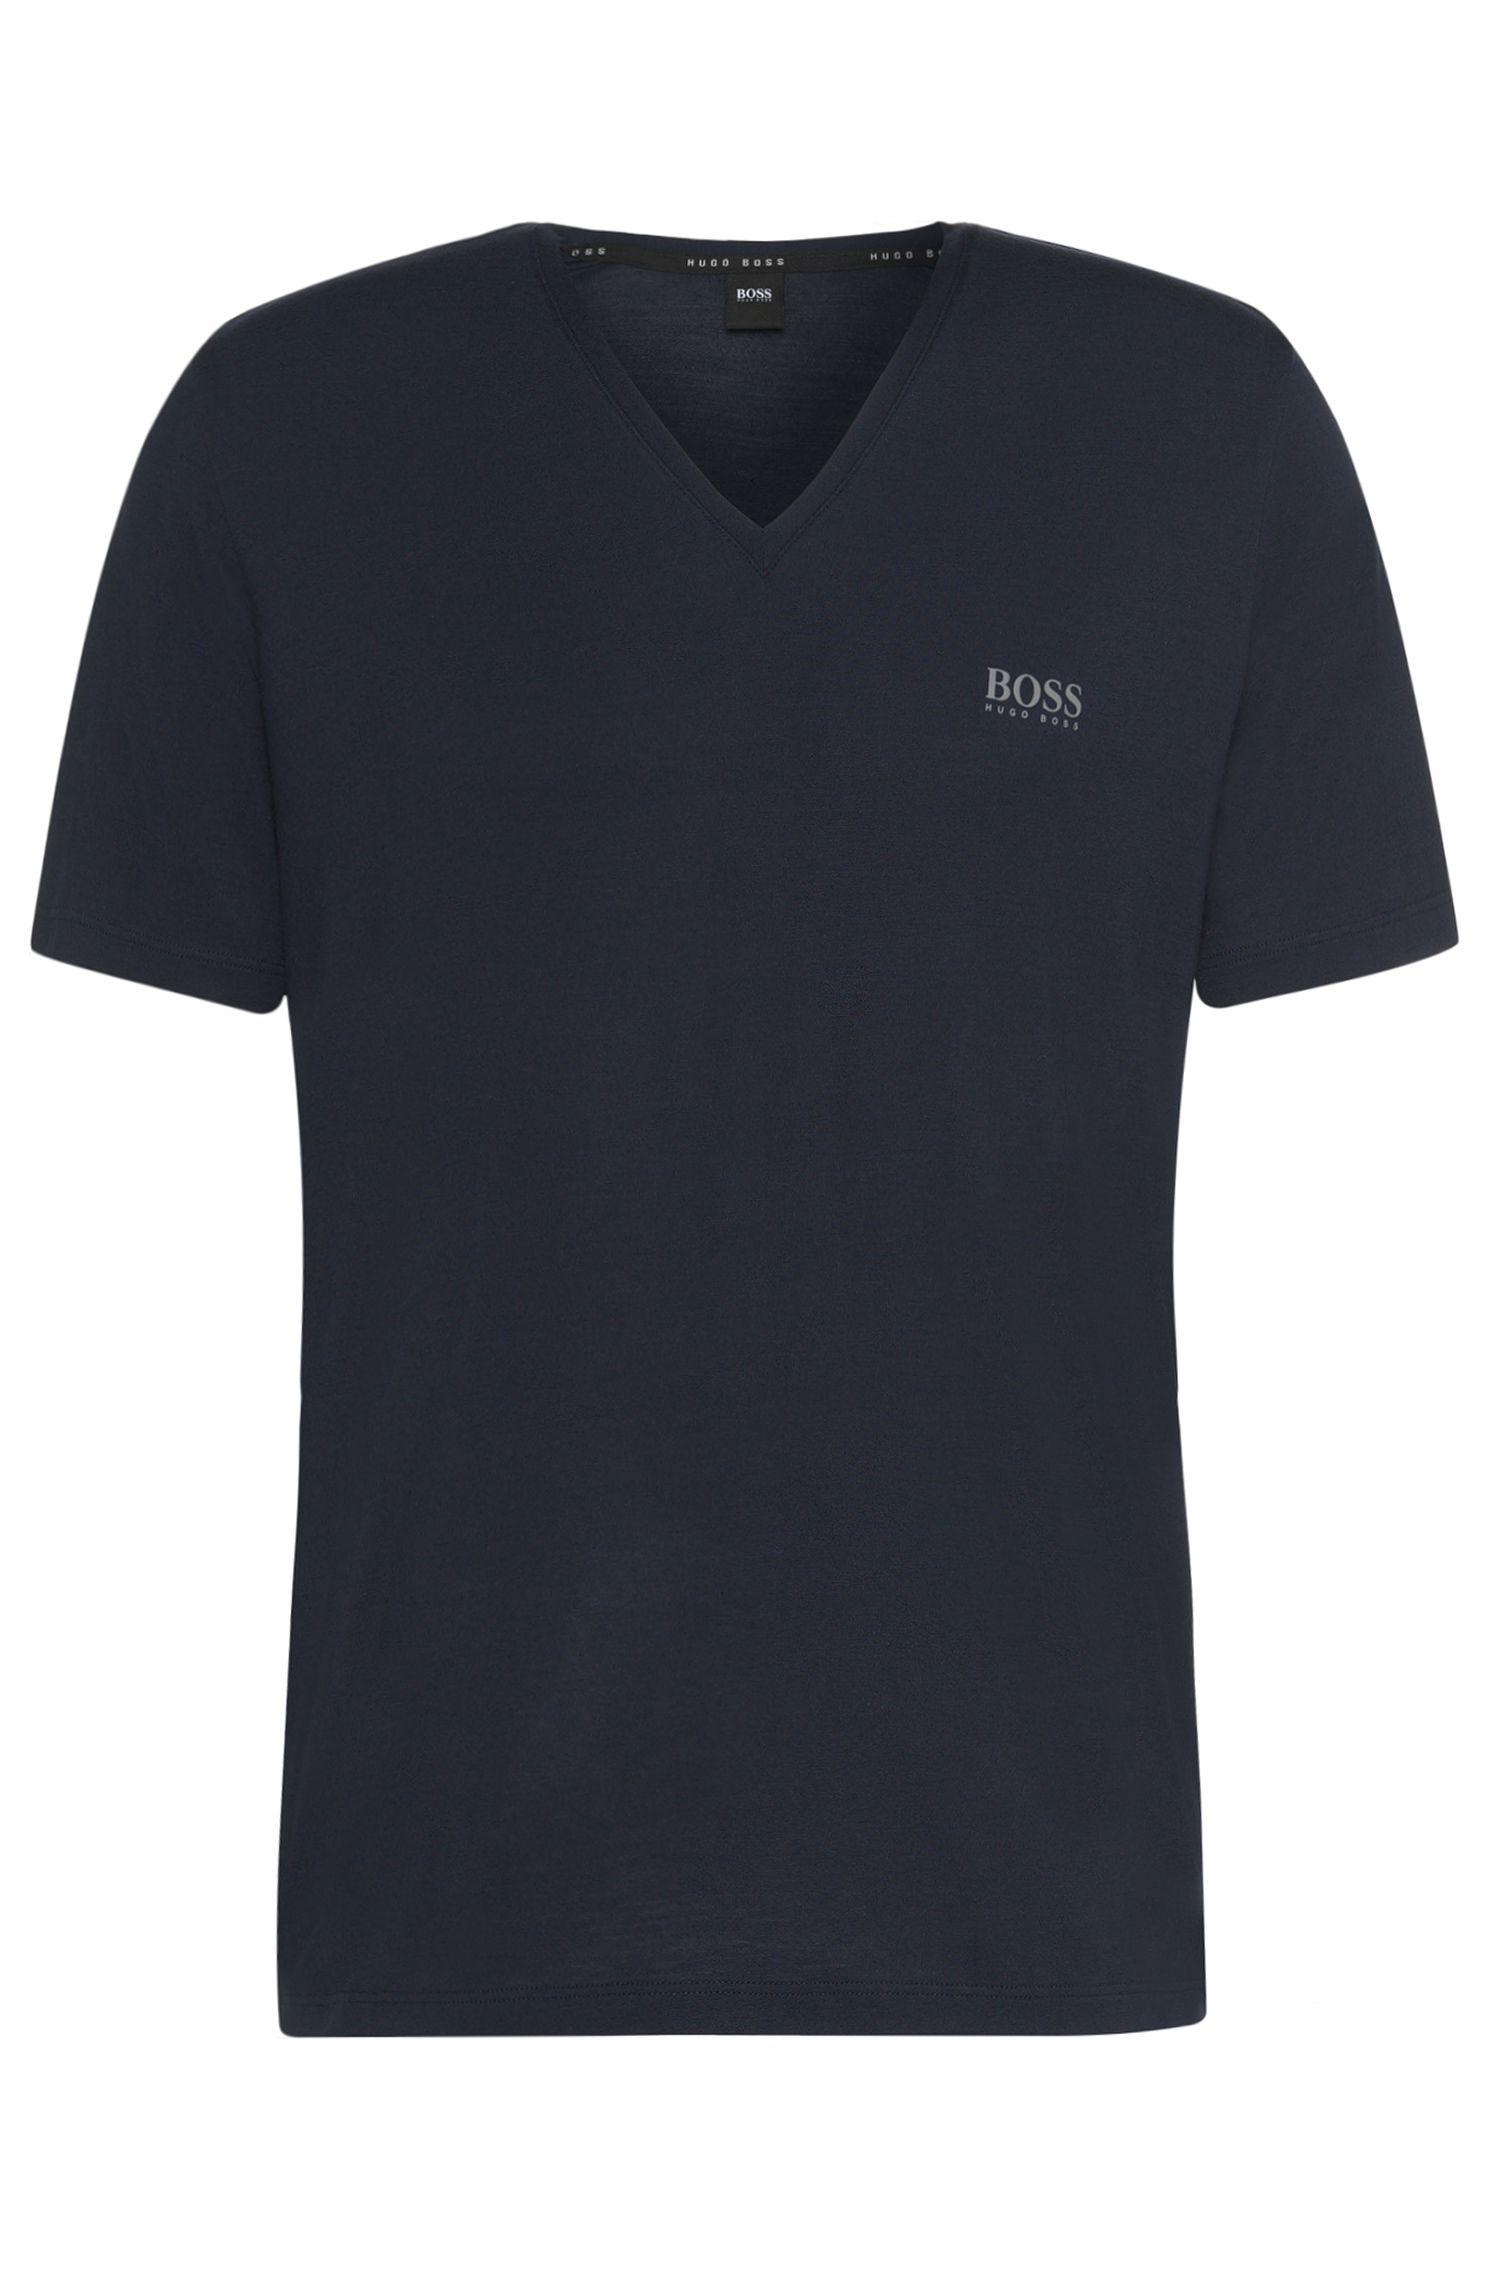 'Shirt VN SS' | Stretch Modal V-Neck T-Shirt